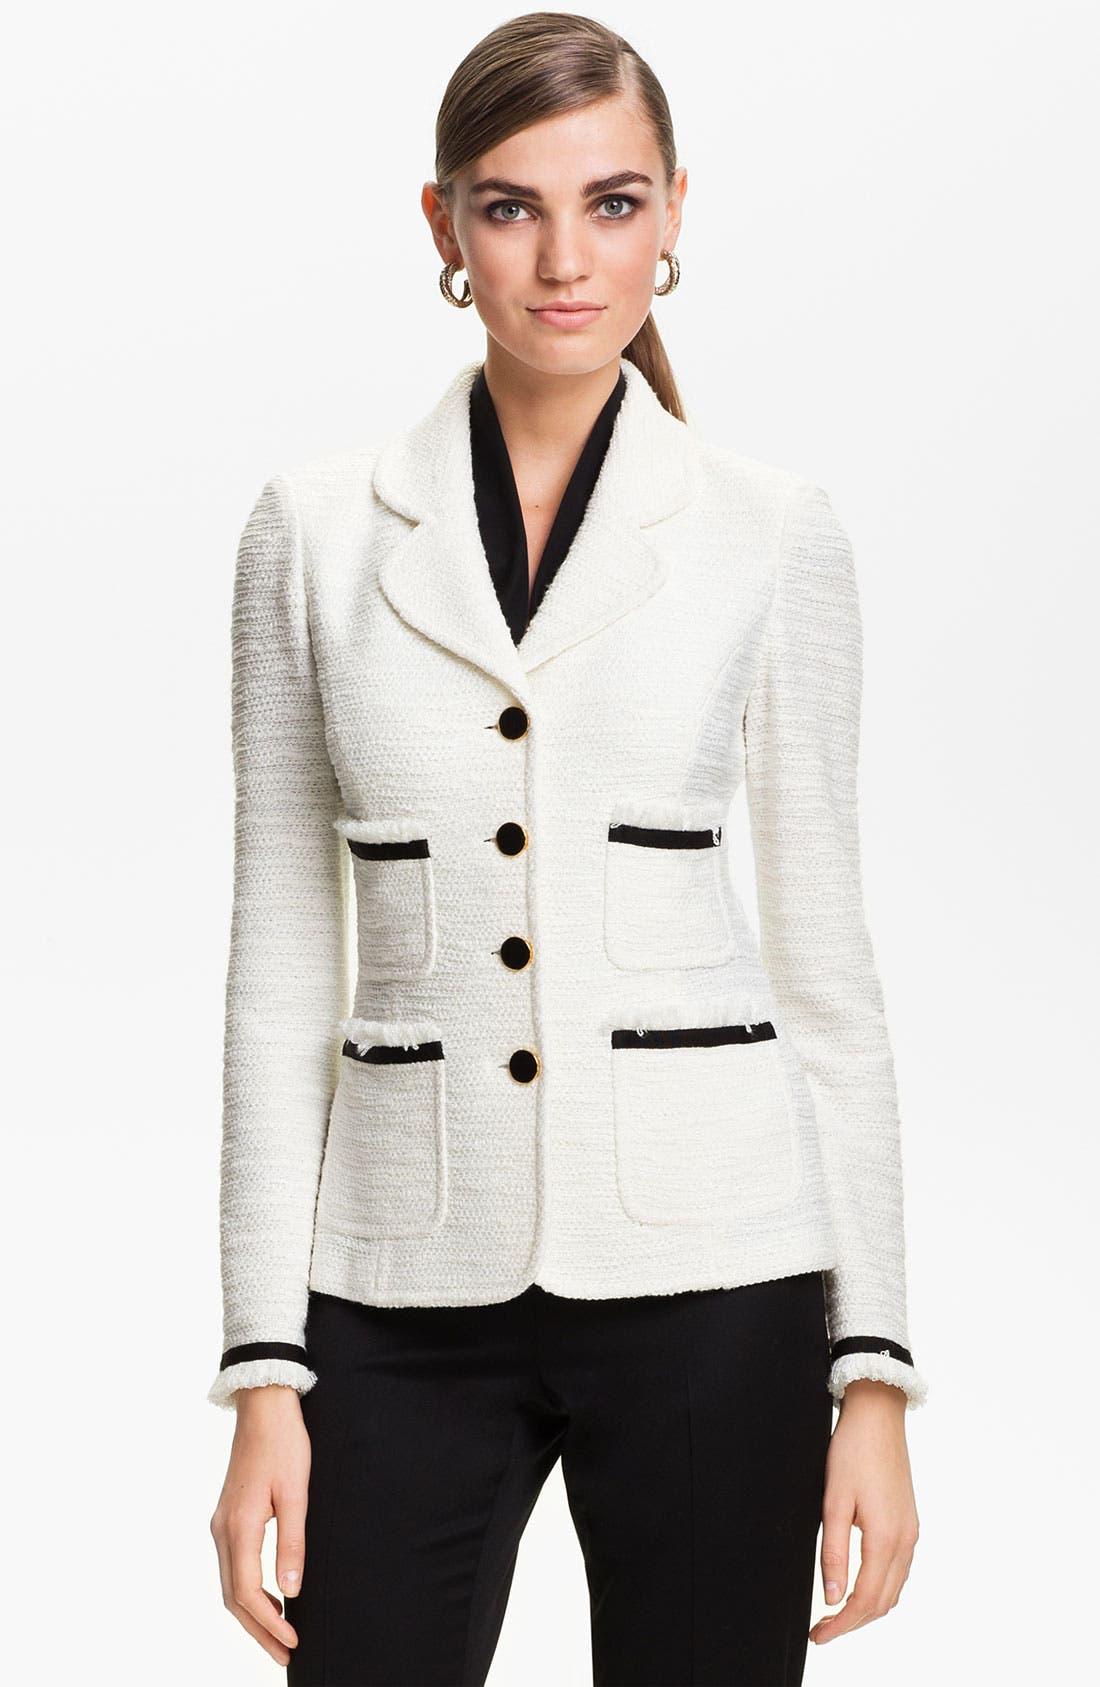 Main Image - St. John Collection 'New Shantung' Jacket